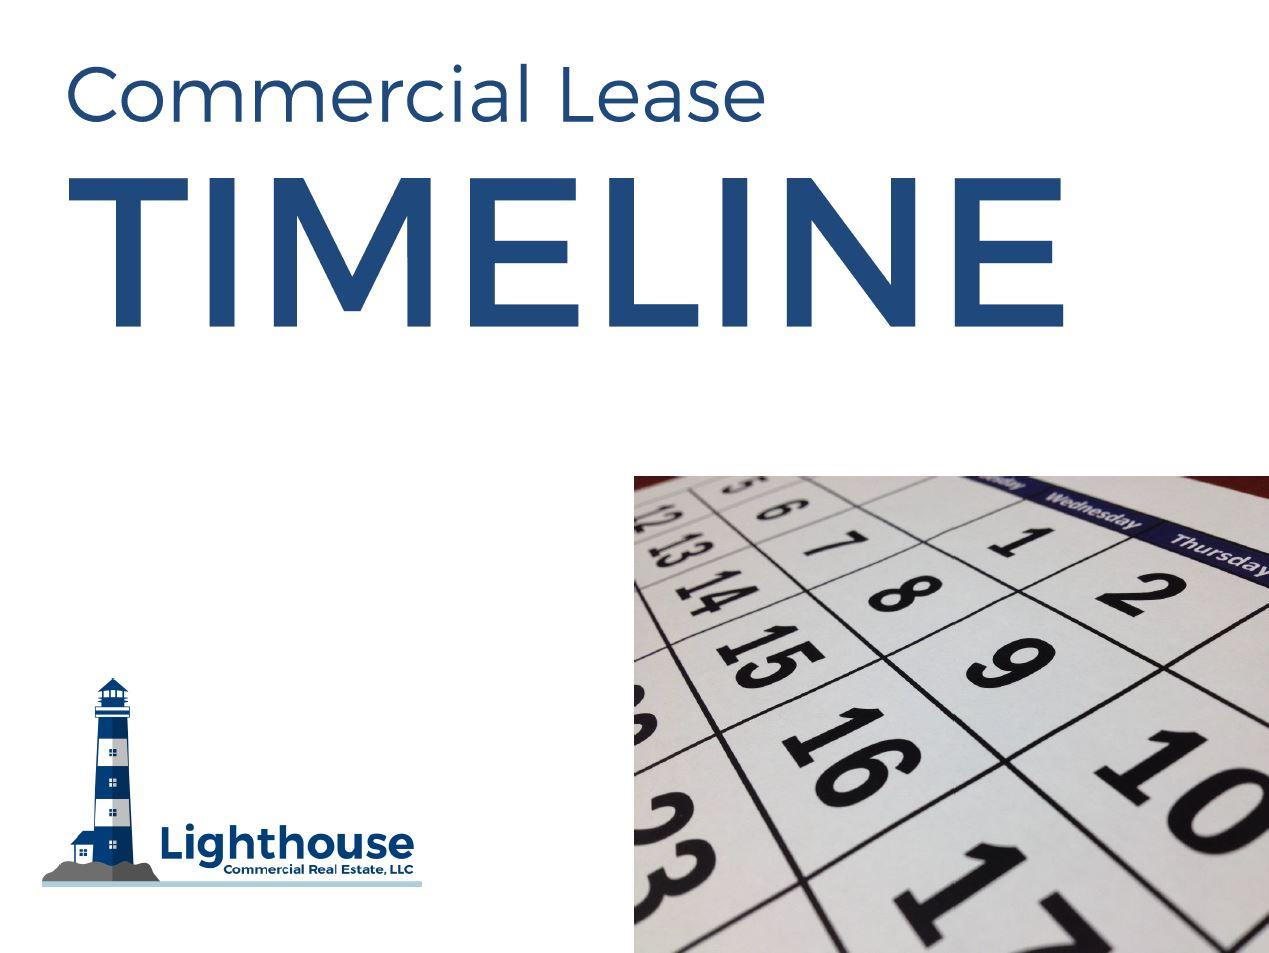 Lighthouse Lease Timeline Checklist